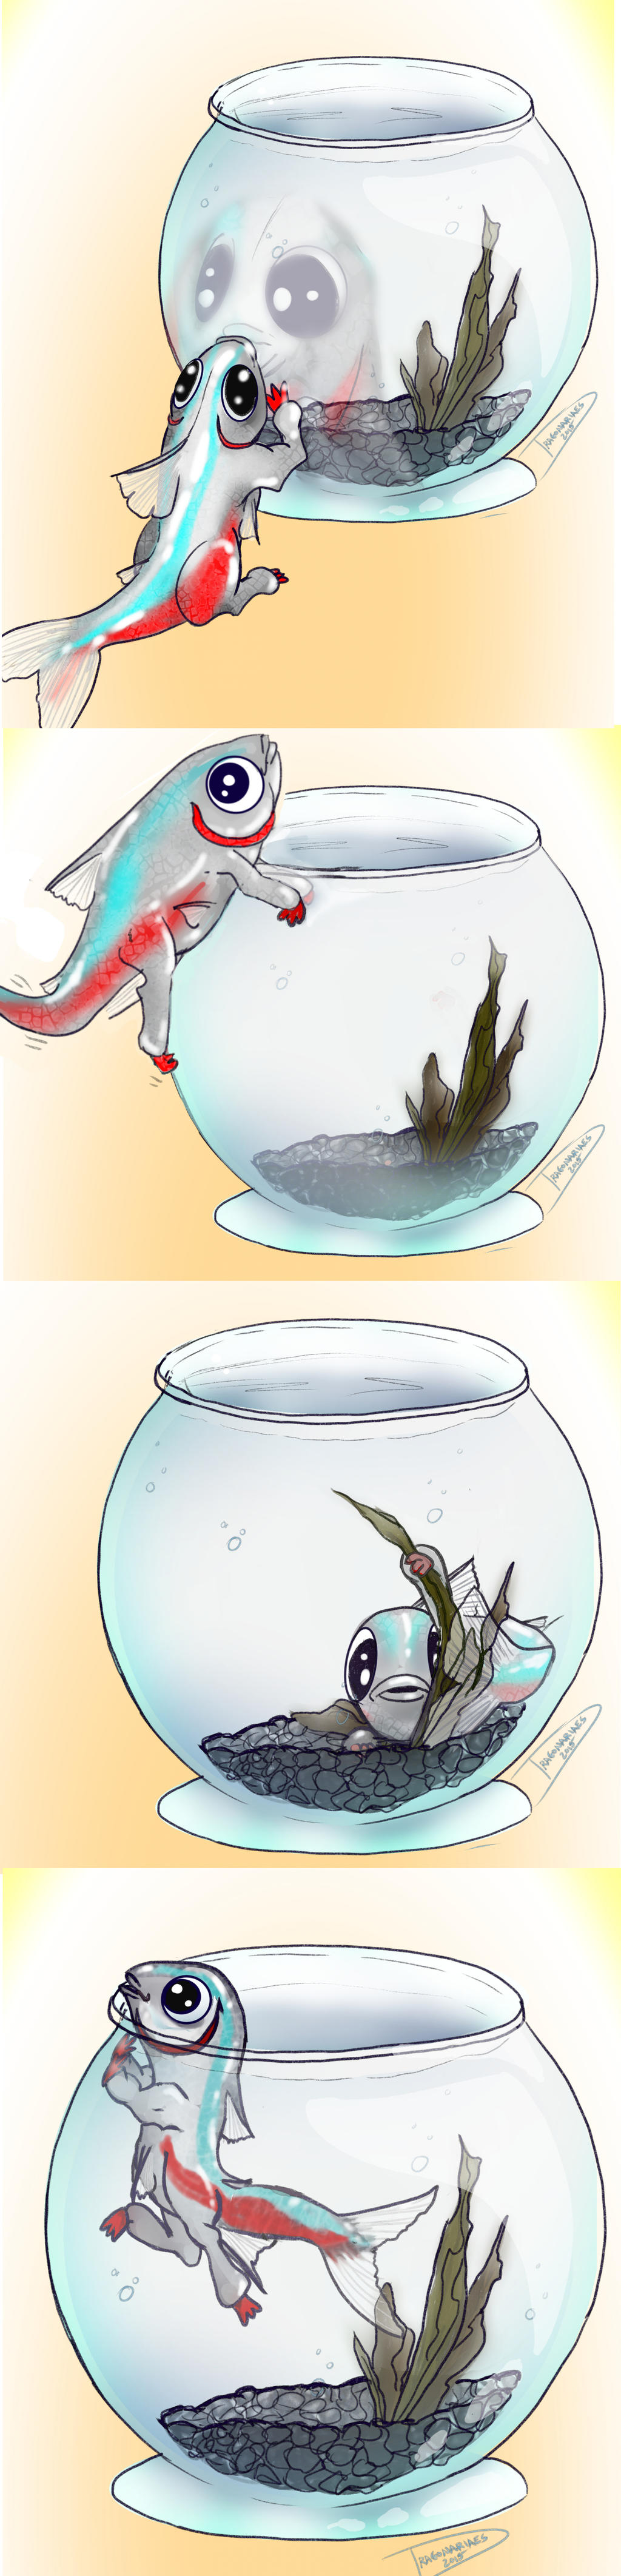 Cuddles Gets a Bowl by dragonariaes